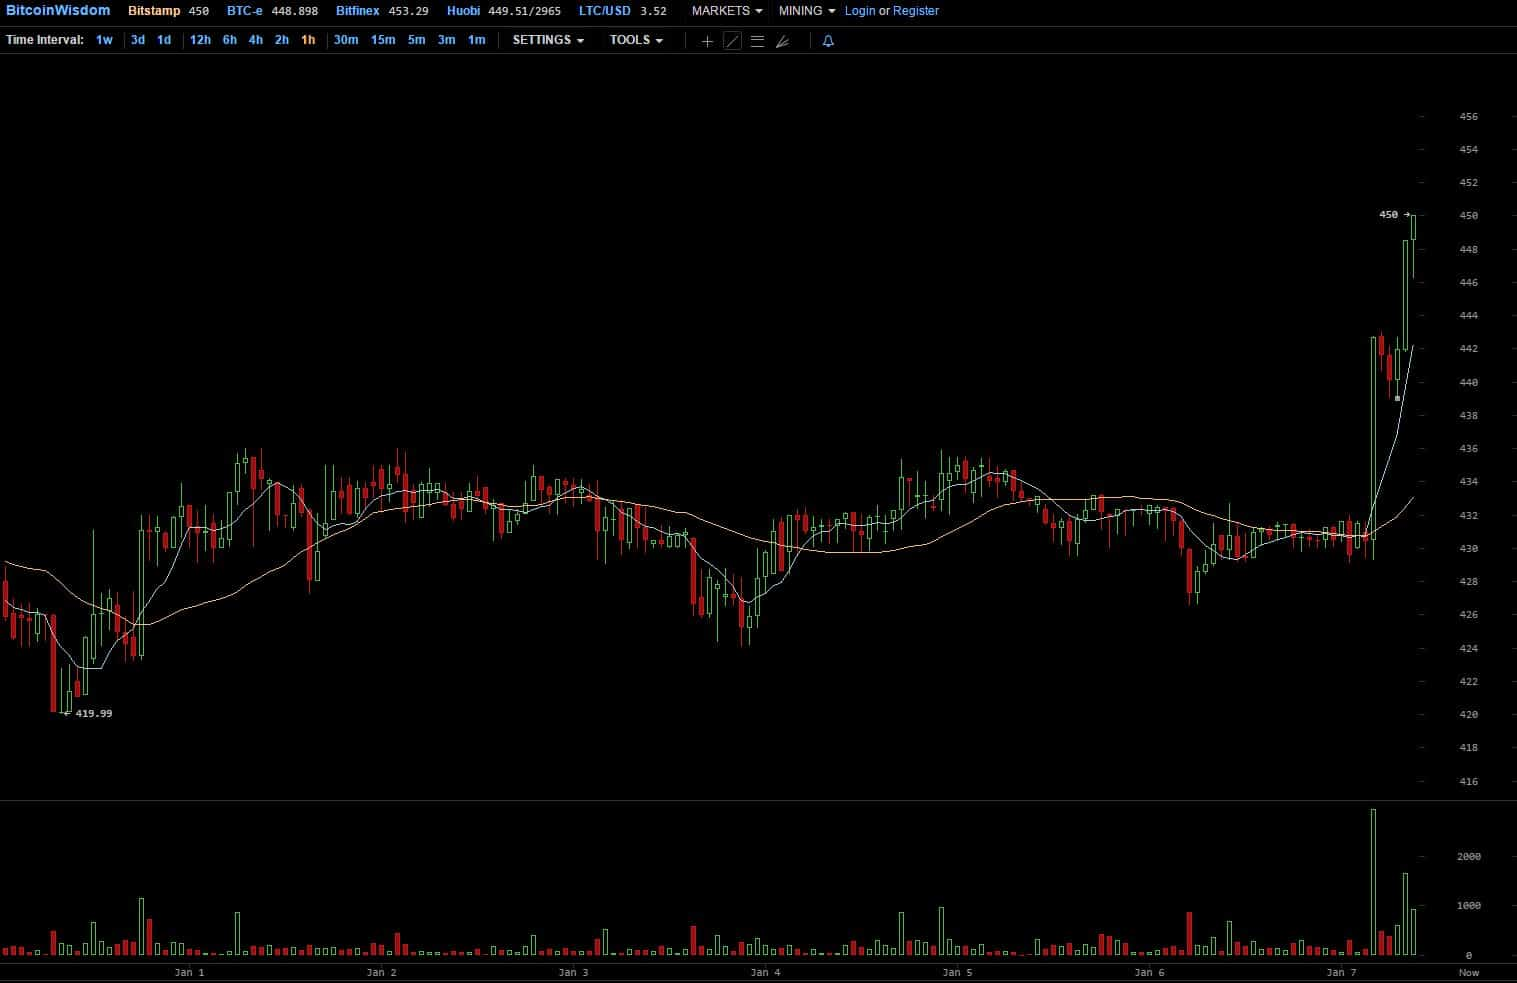 Bitcoin price, January 7. Source: Bitcoinwisdom